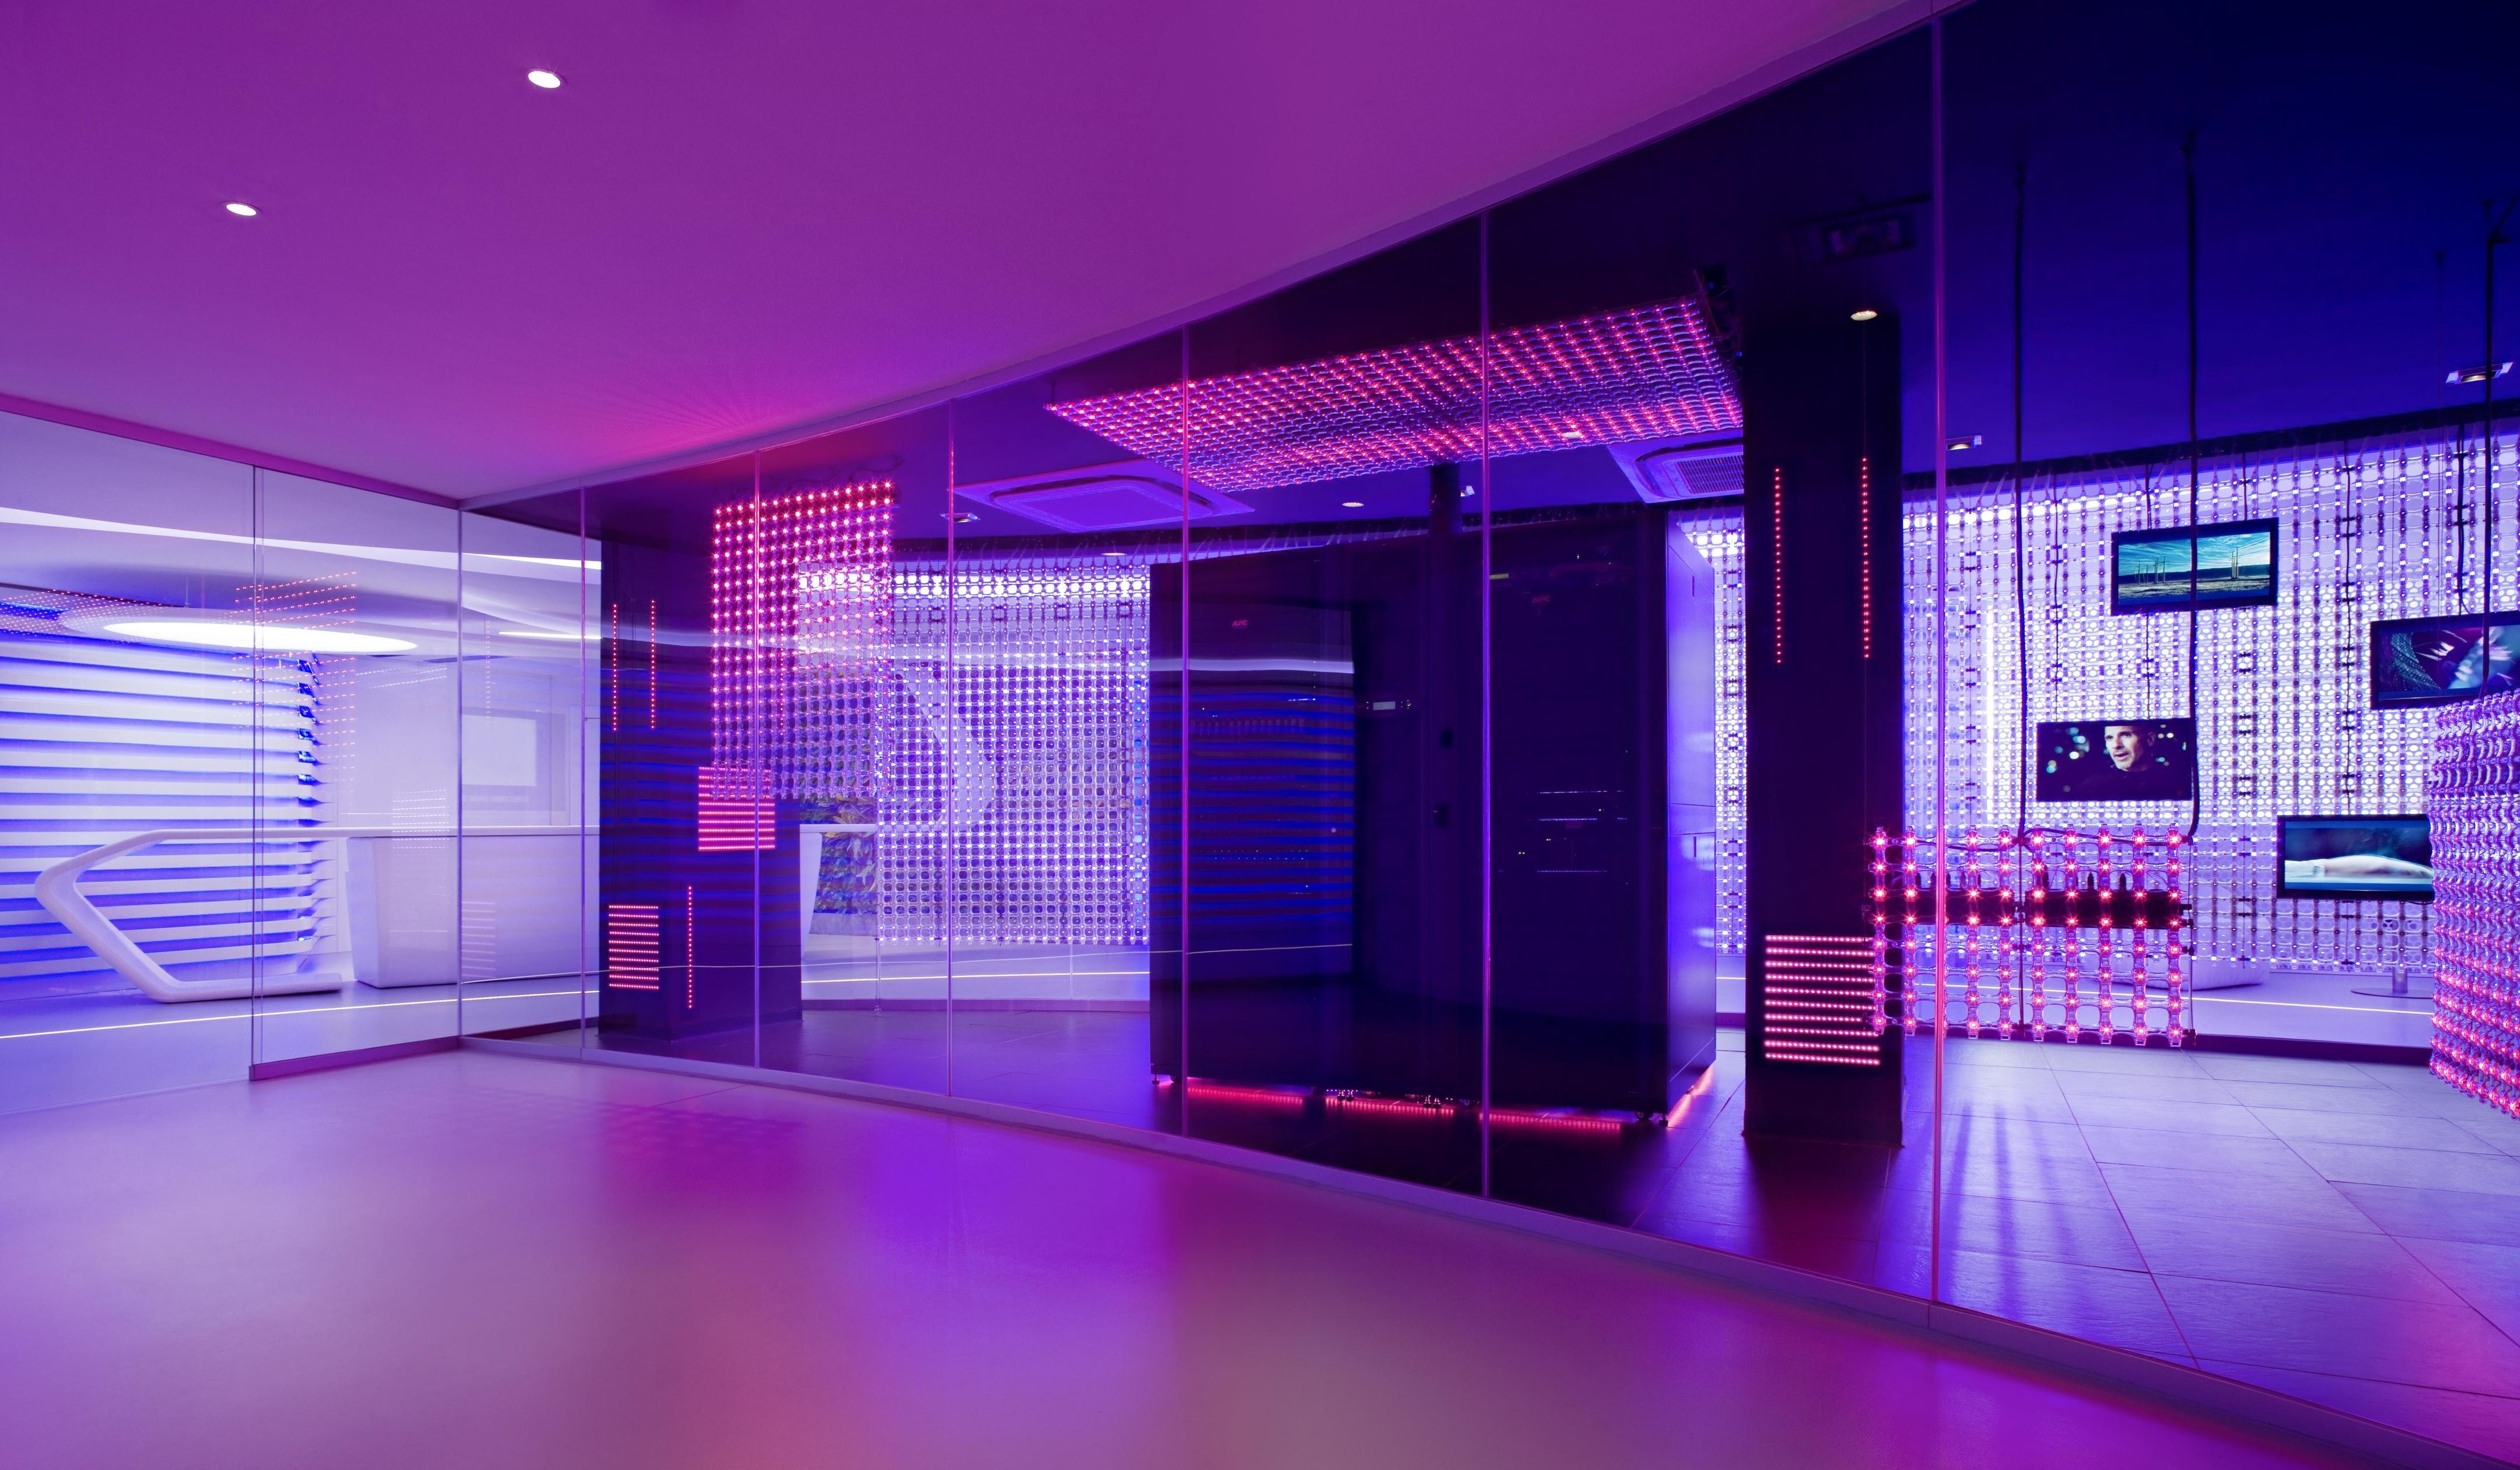 Data Center 4320 × 2520 - Ibm Software Executive Briefing Center , HD Wallpaper & Backgrounds